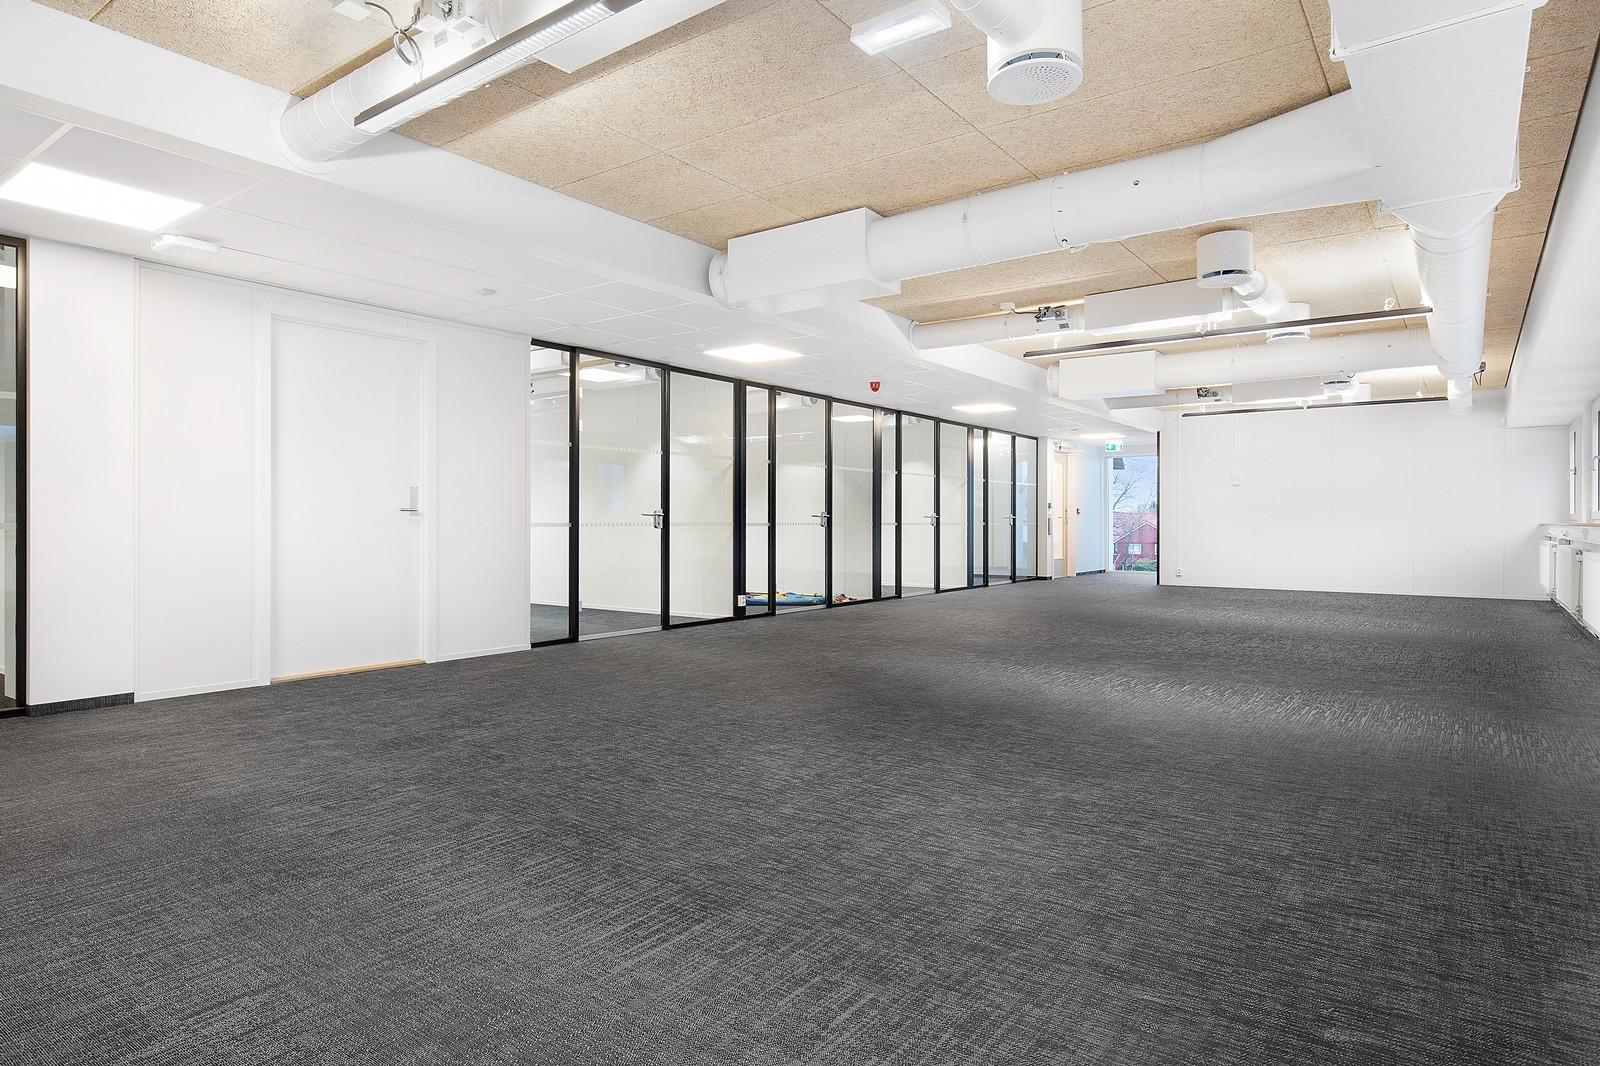 Flotte cellekontorer og romslige arealer for åpent kontorlandskap.